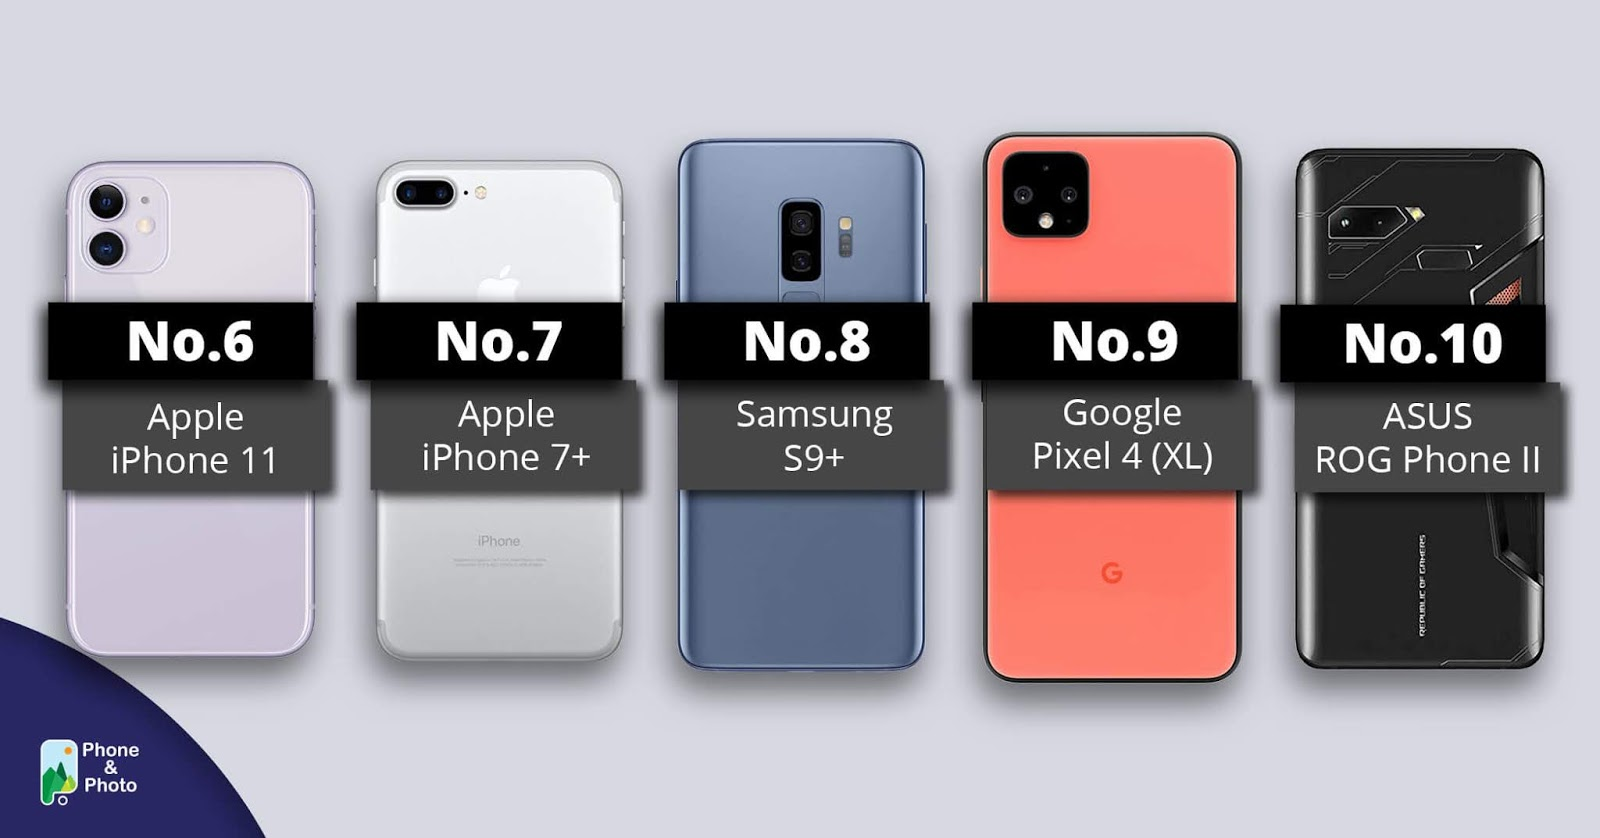 Top 10 Best Camera Phone of Feb. 2020 Above USD 500_Top 6~Top 10